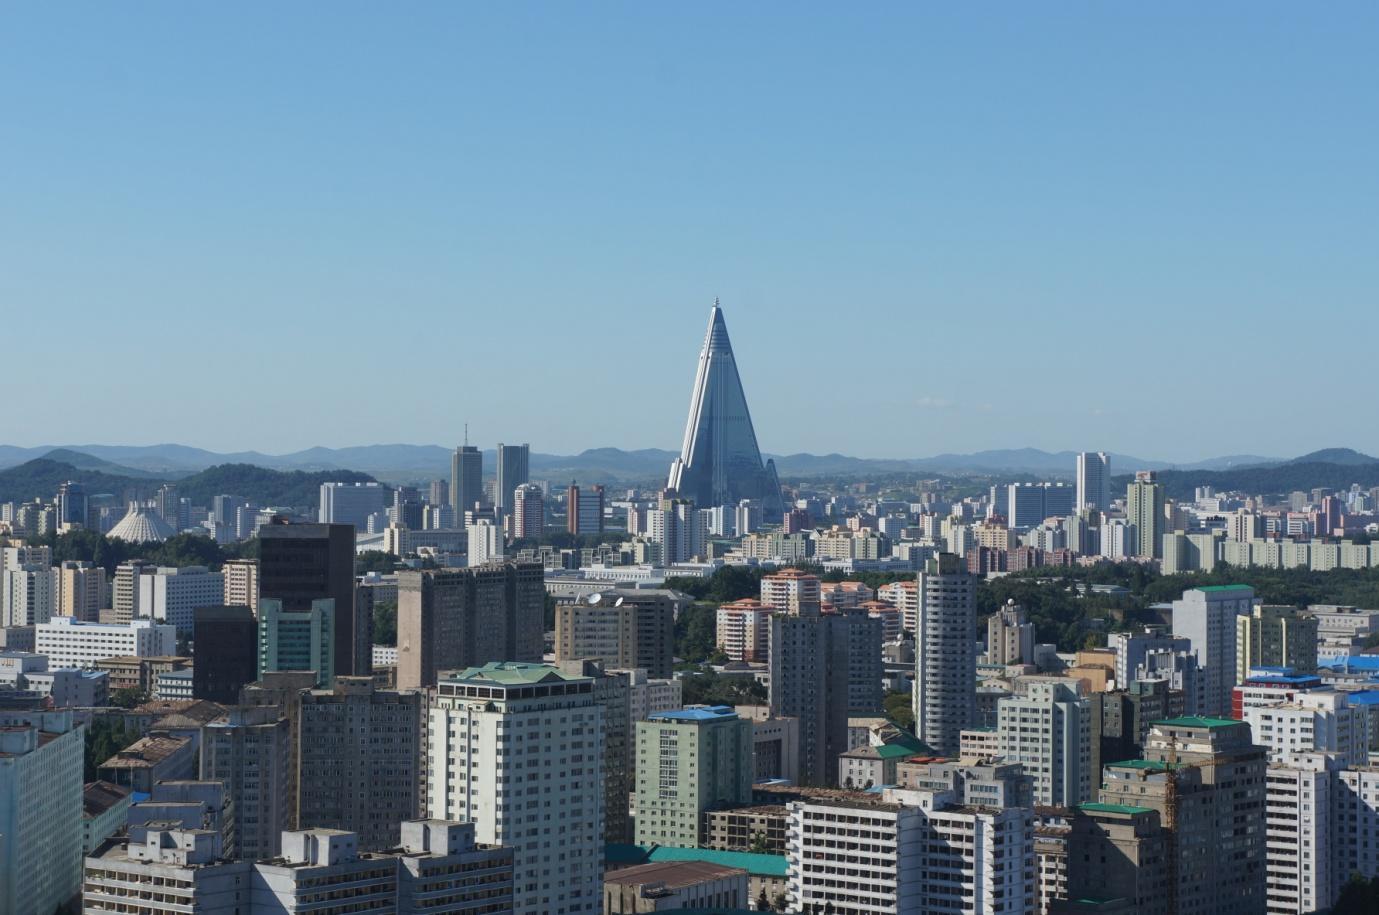 Pyongyang_City_-_Ryugyong_Hotel_in_Background_(13913572409).jpg